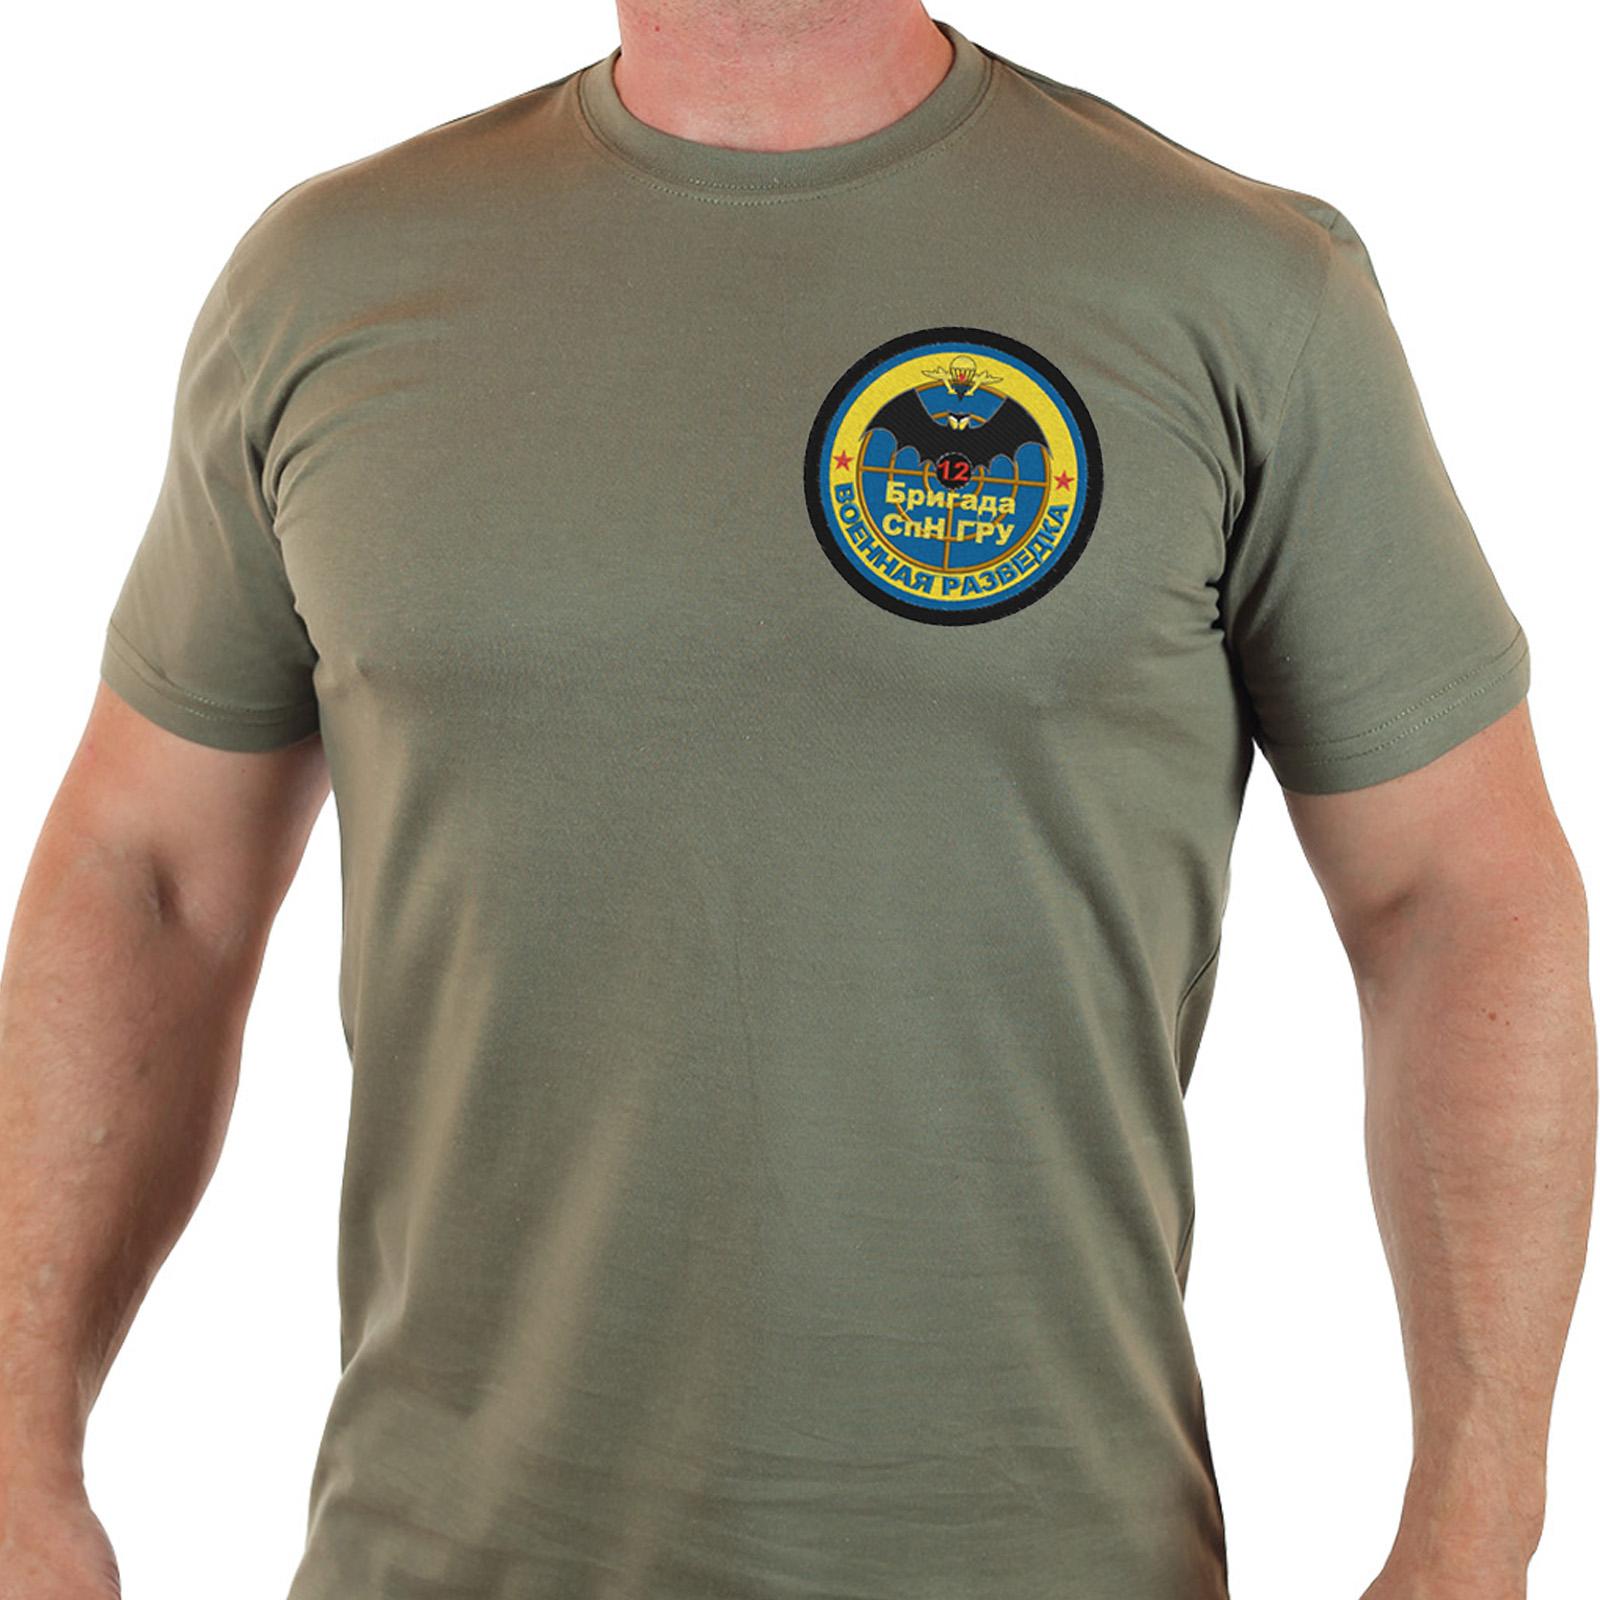 Презентабельная мужская футболка с шевроном 12 бригады СпН ГРУ